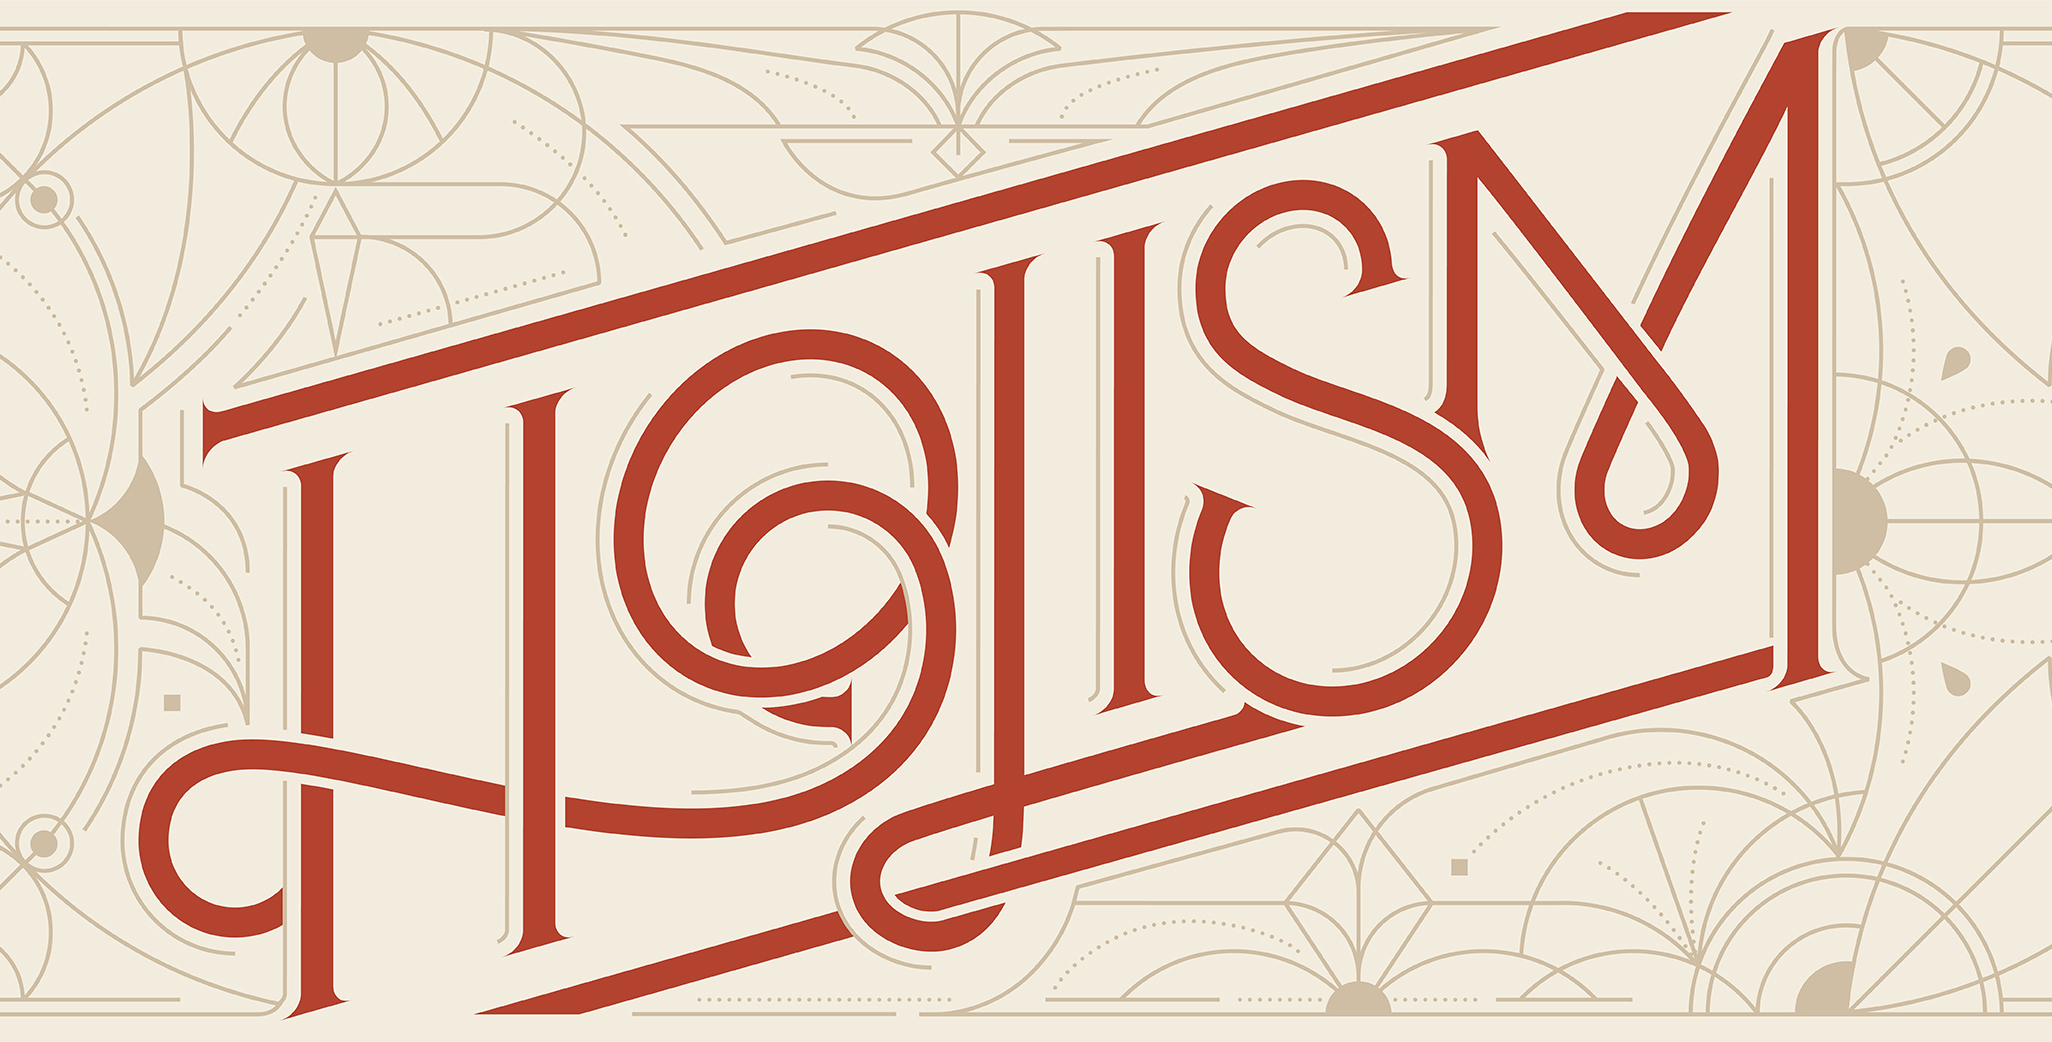 Holism 1